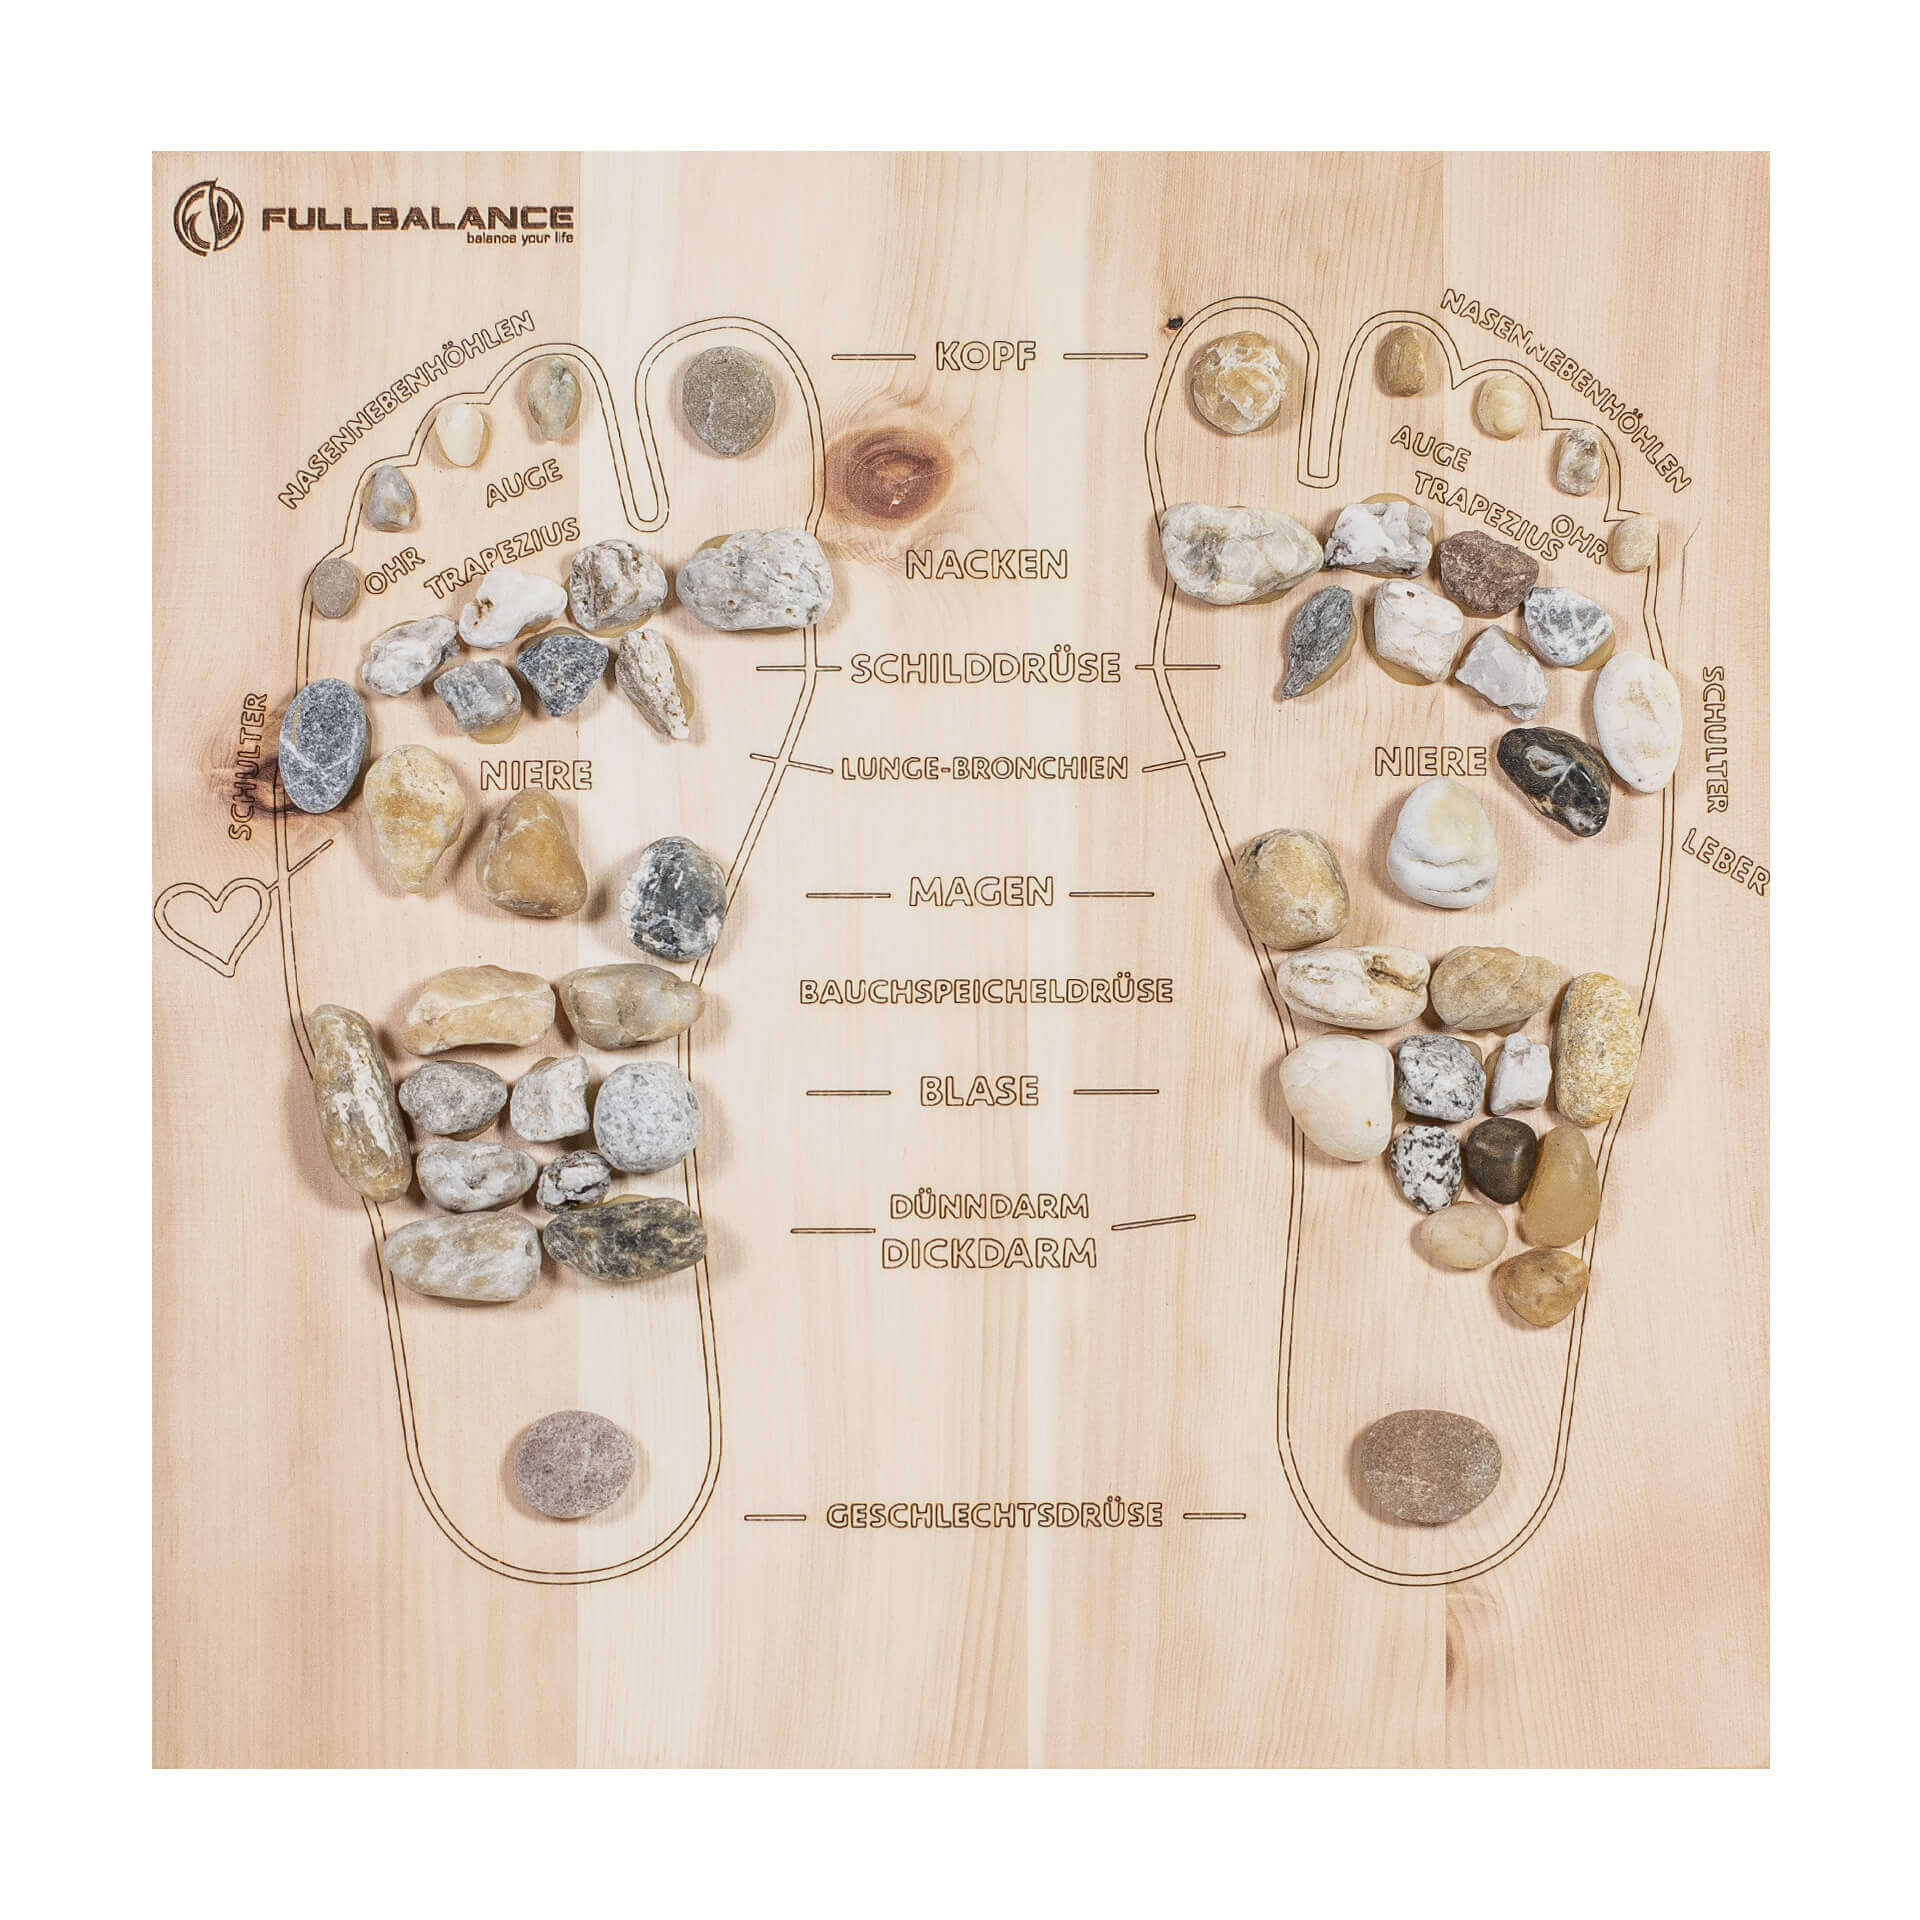 Pine & Stone Fußreflexzonenmassage Brett Maßanfertigung